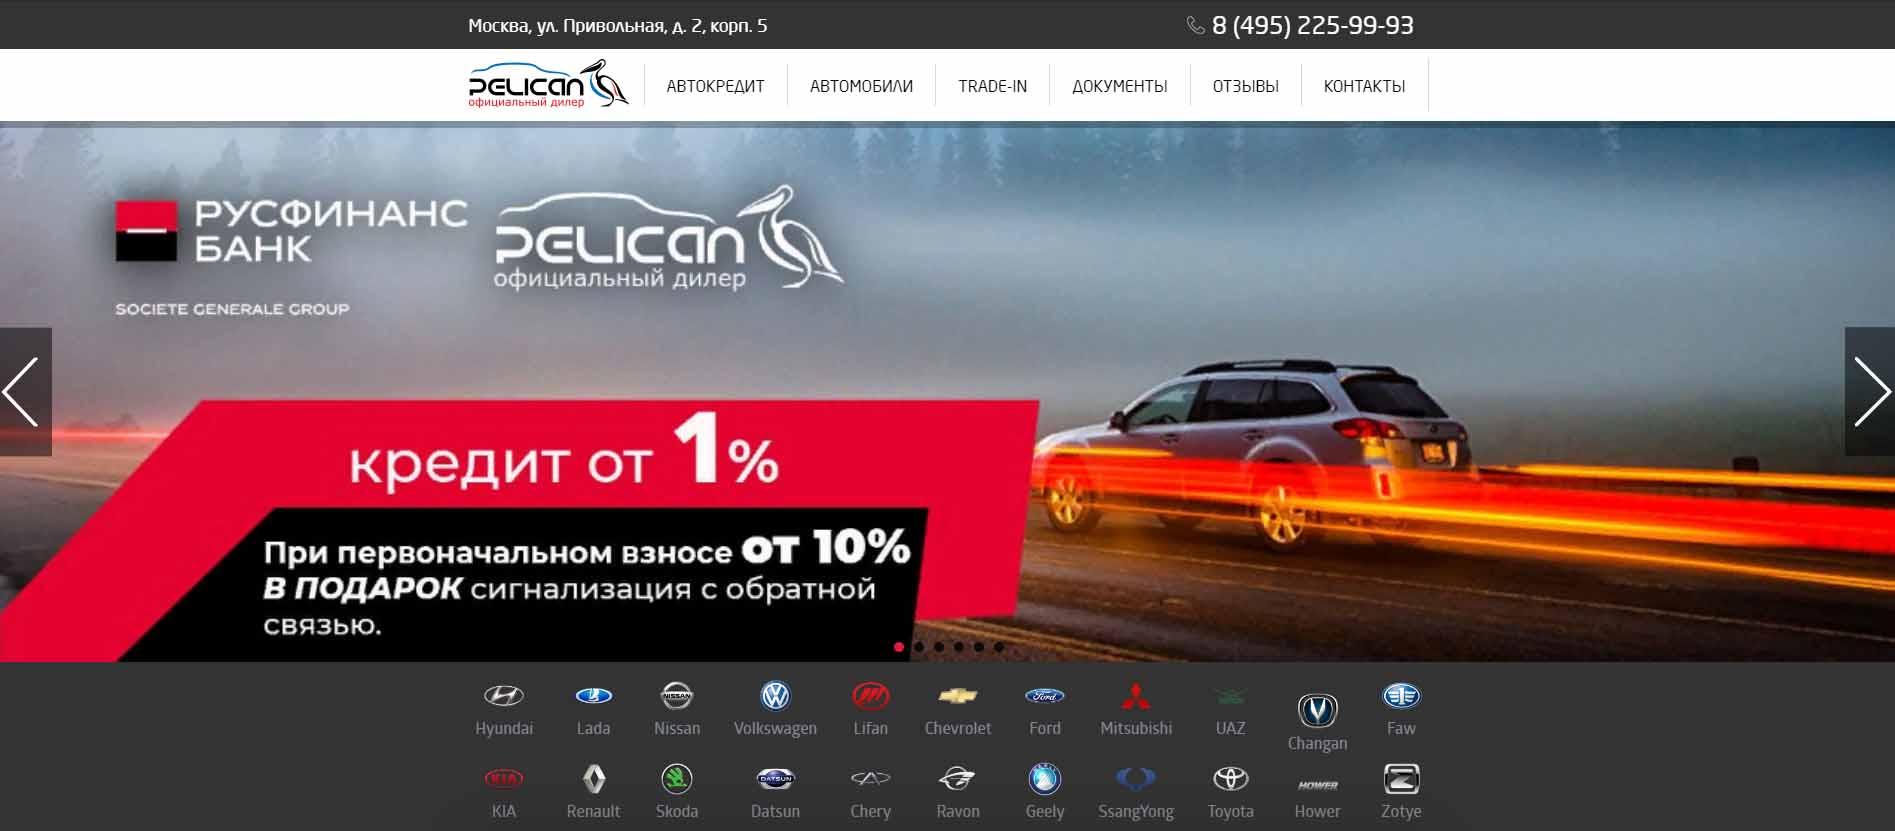 Pelican-Motors